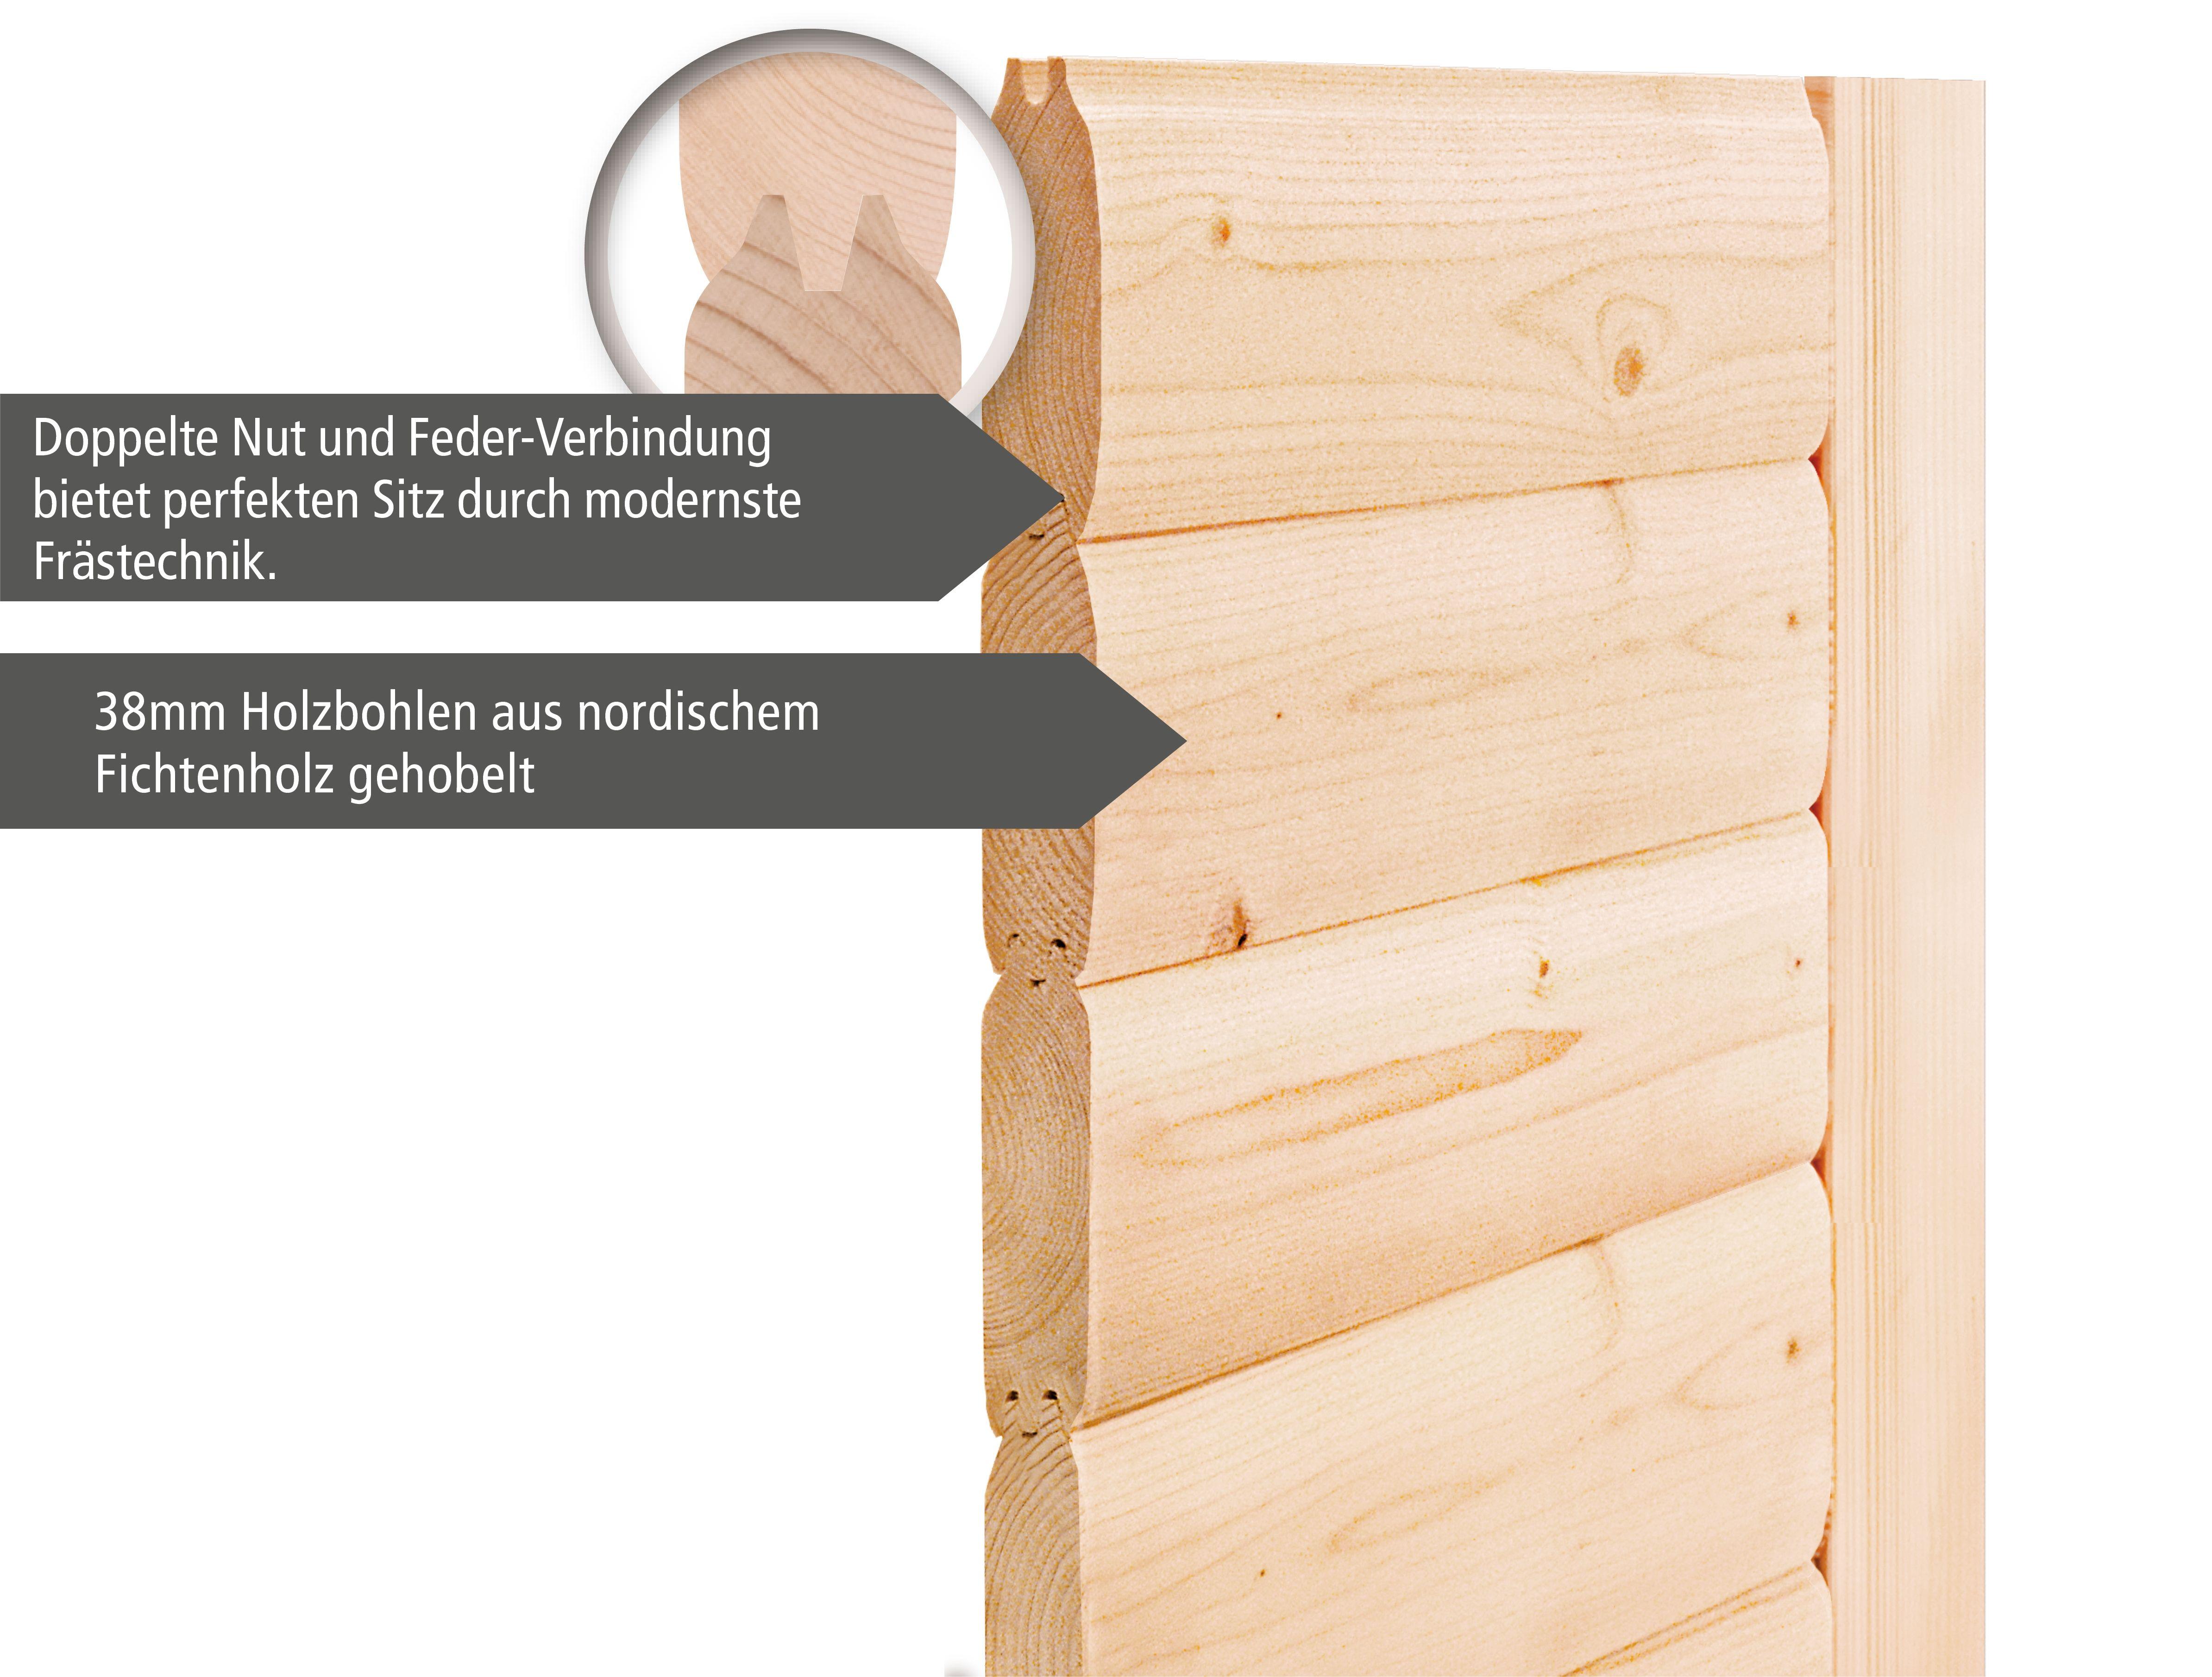 Woodfeeling Sauna Kiana 38mm Bio Saunaofen 9 kW extern Bild 11